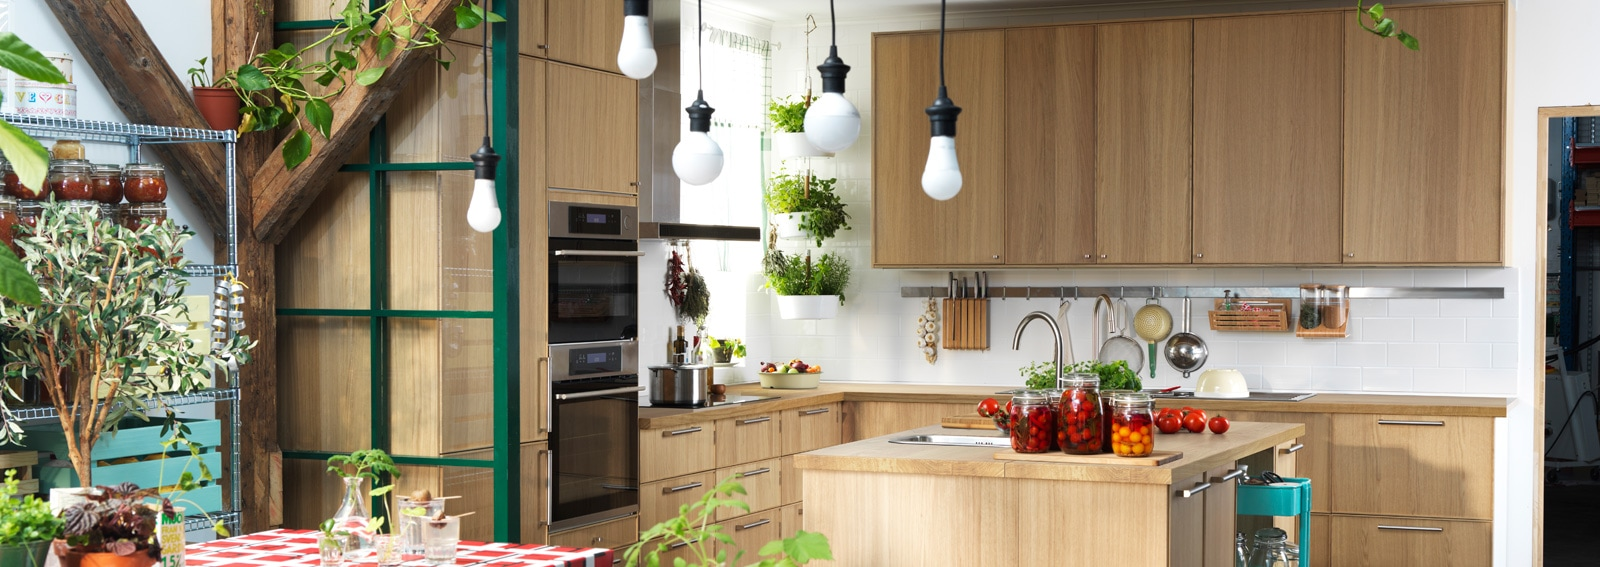 Awesome Cucine Ikea Catalogo 2014 Ideas - Home Ideas - tyger.us